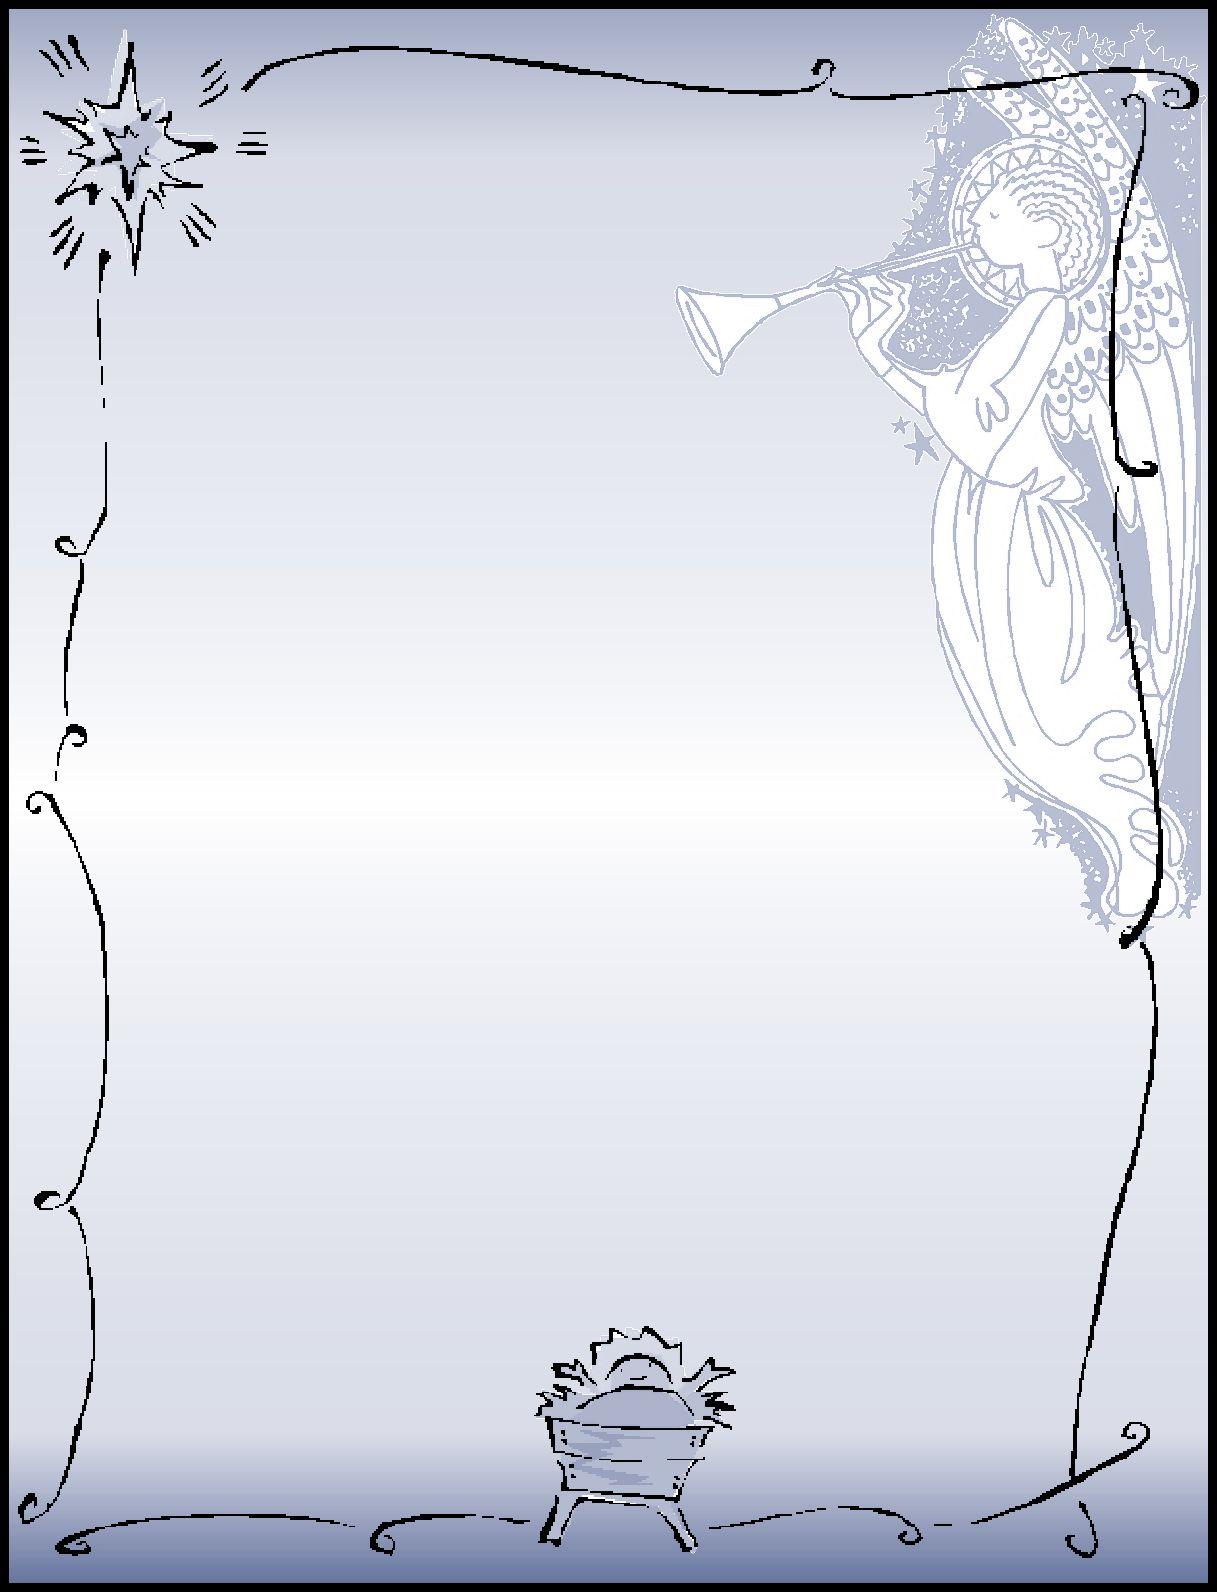 manger scene borders and backgrounds